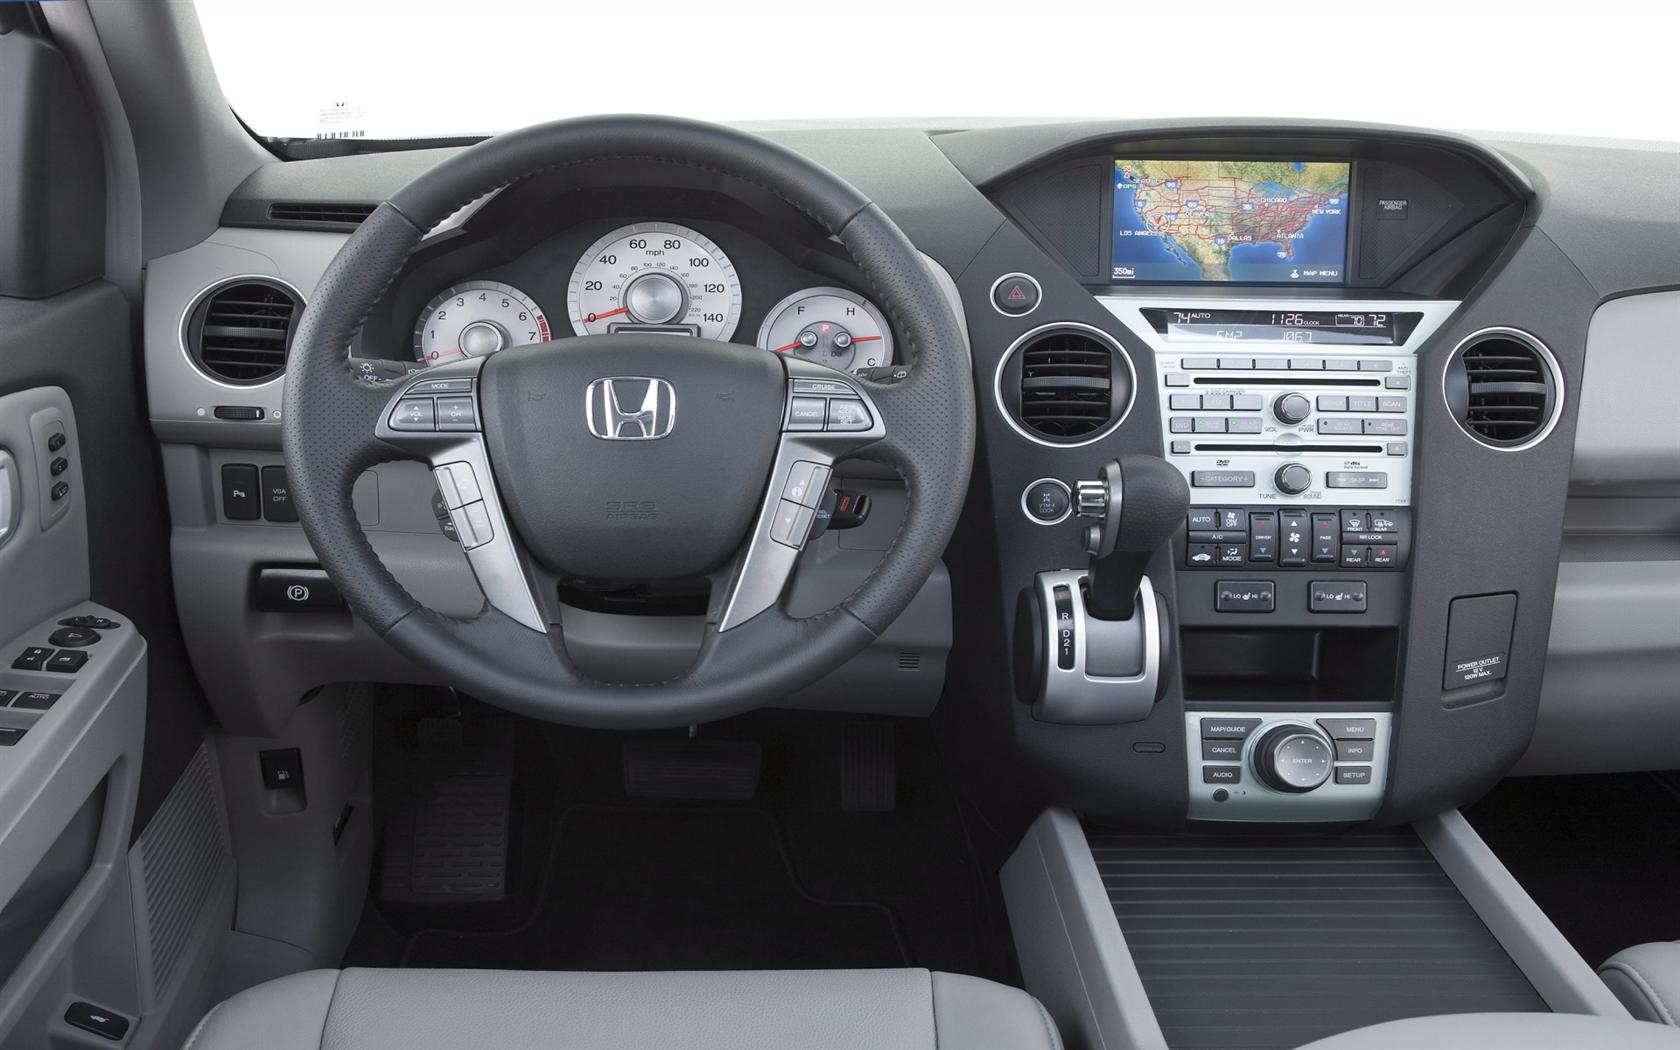 2010 Honda Pilot Image